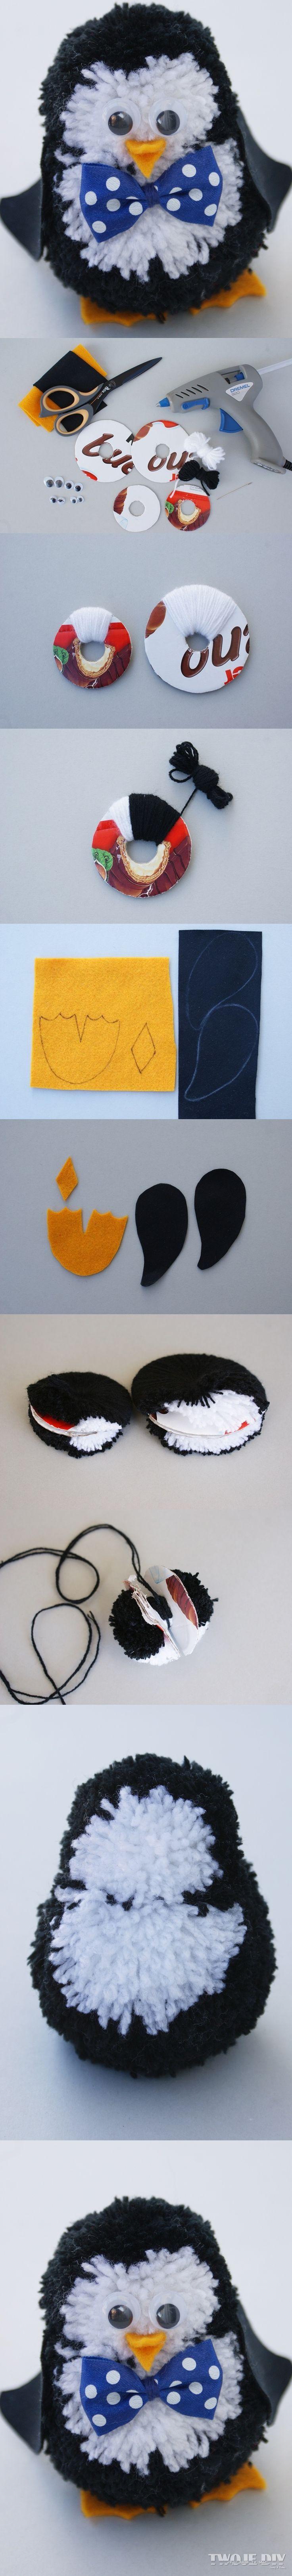 Pinguin met pompoms: